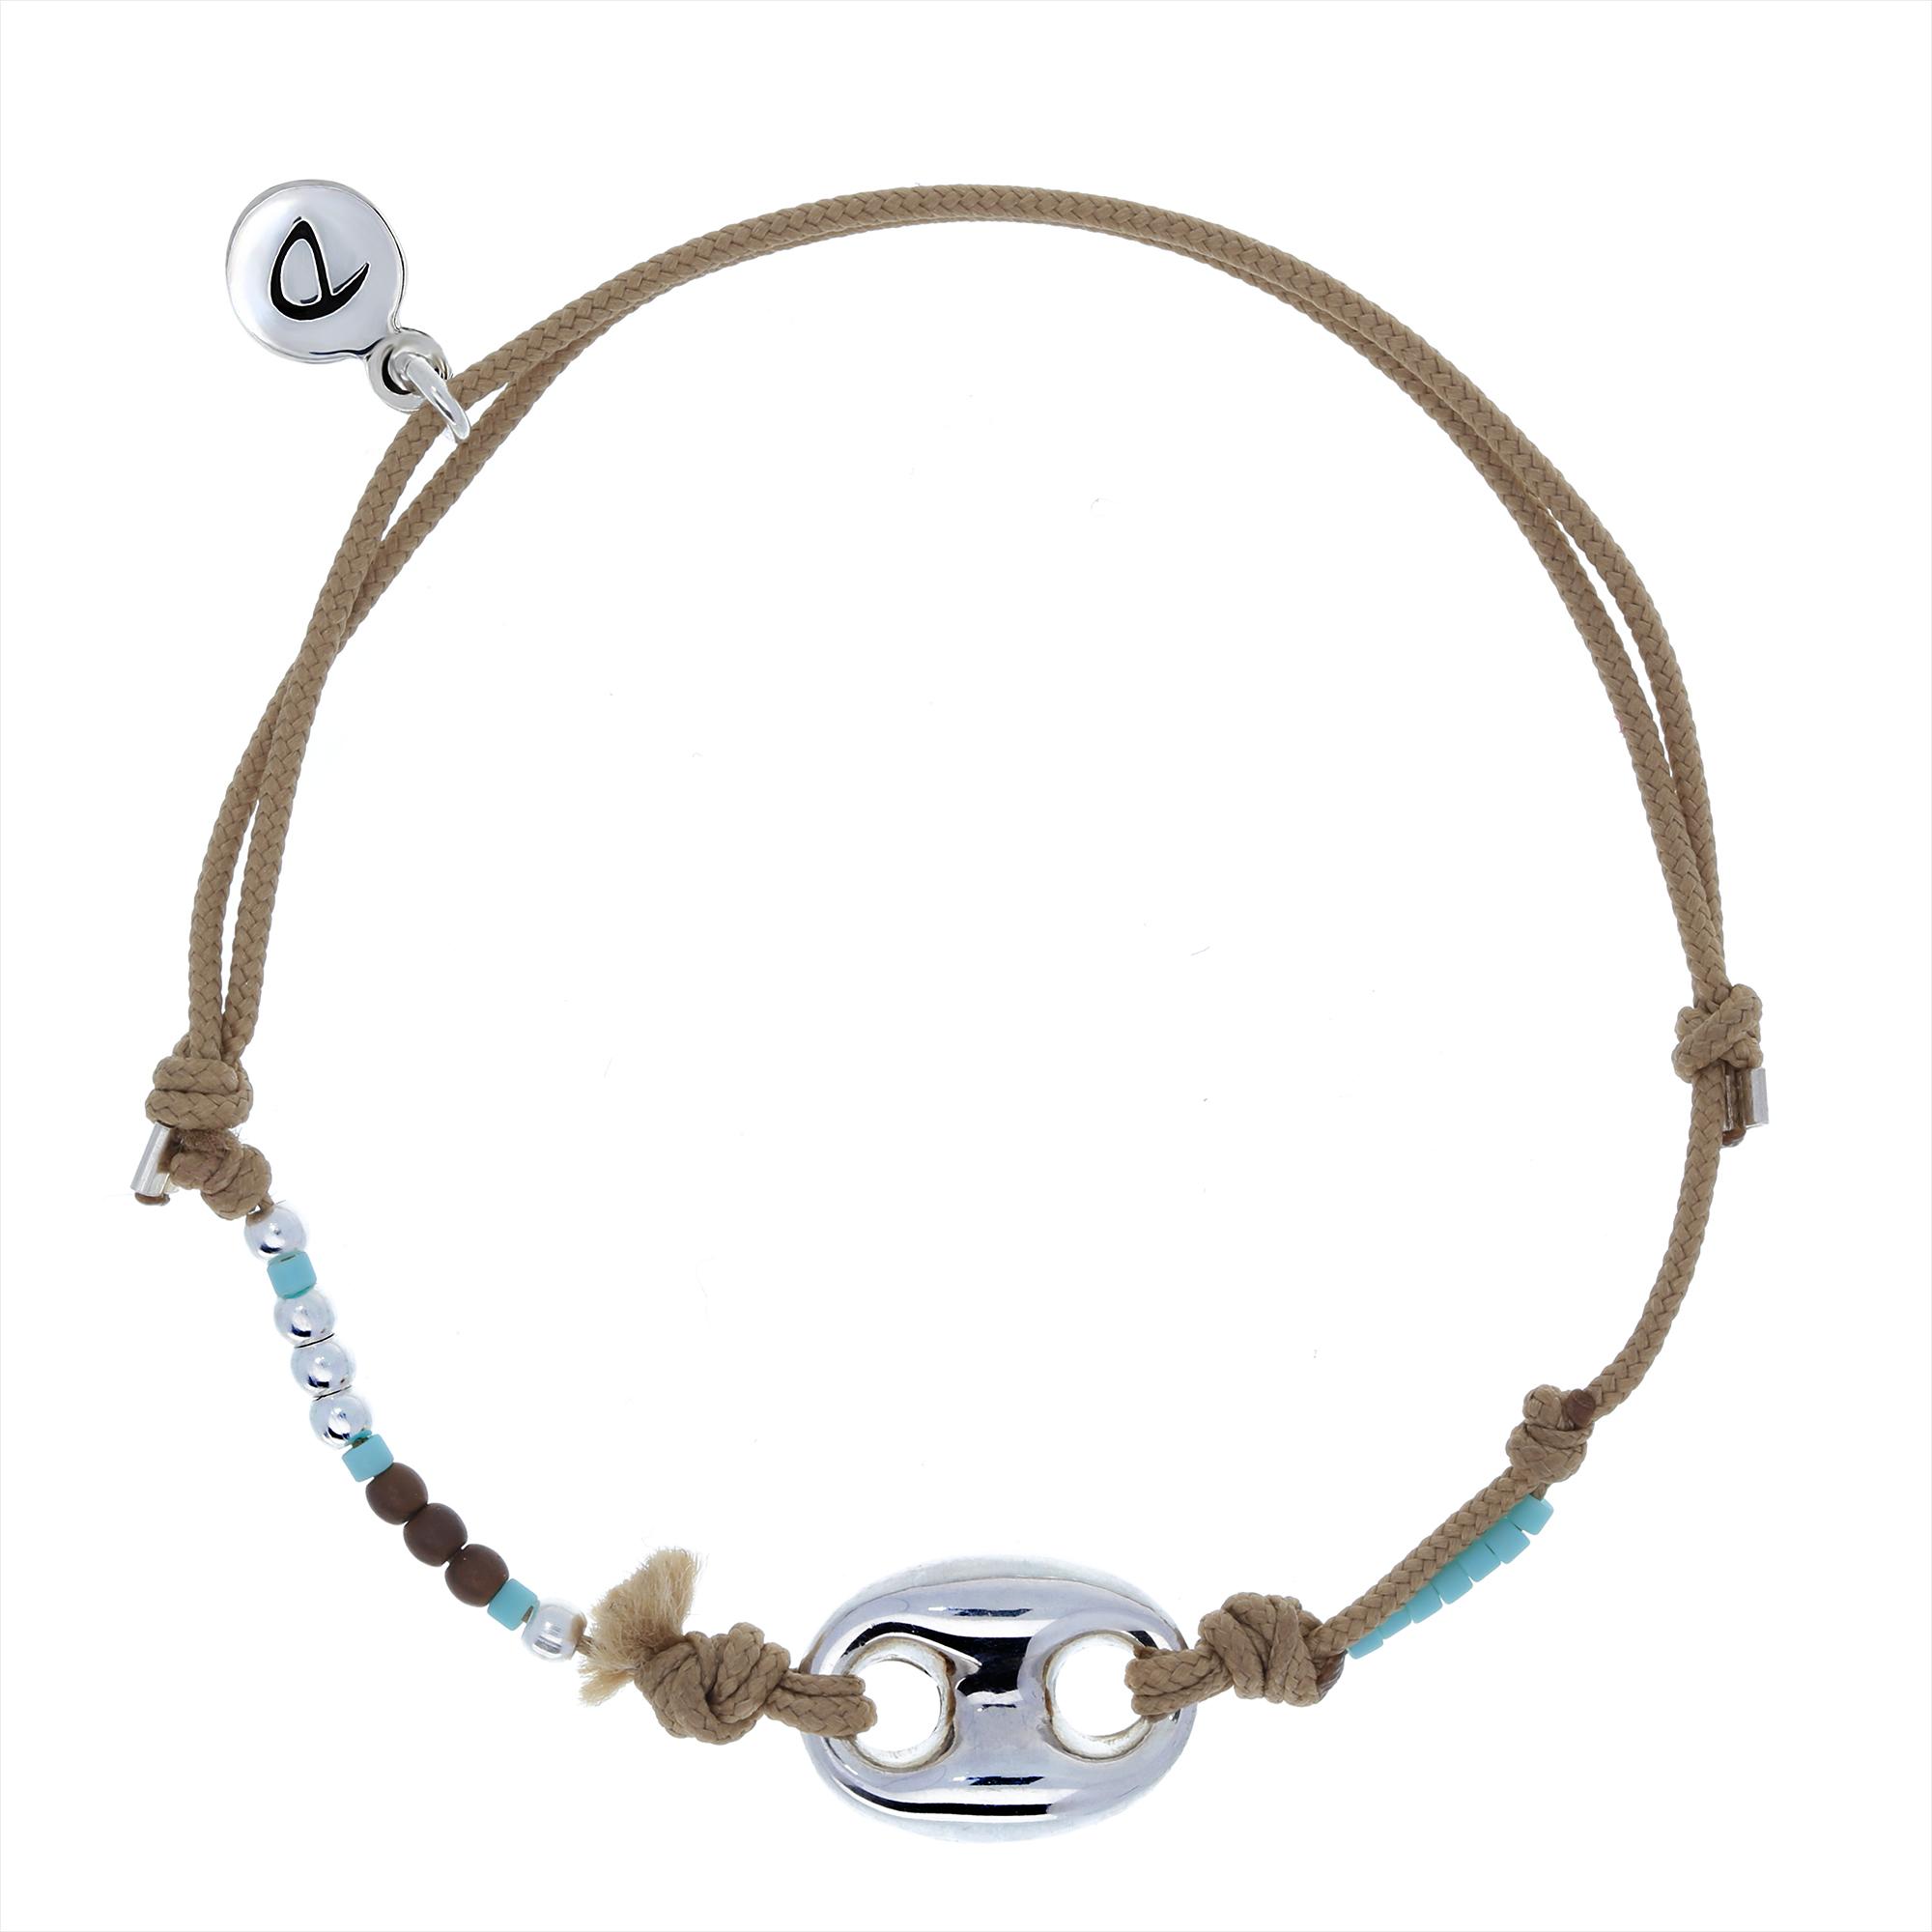 bracelet homme graine de cafe beige perle lagon bracelets homme doriane bijoux. Black Bedroom Furniture Sets. Home Design Ideas